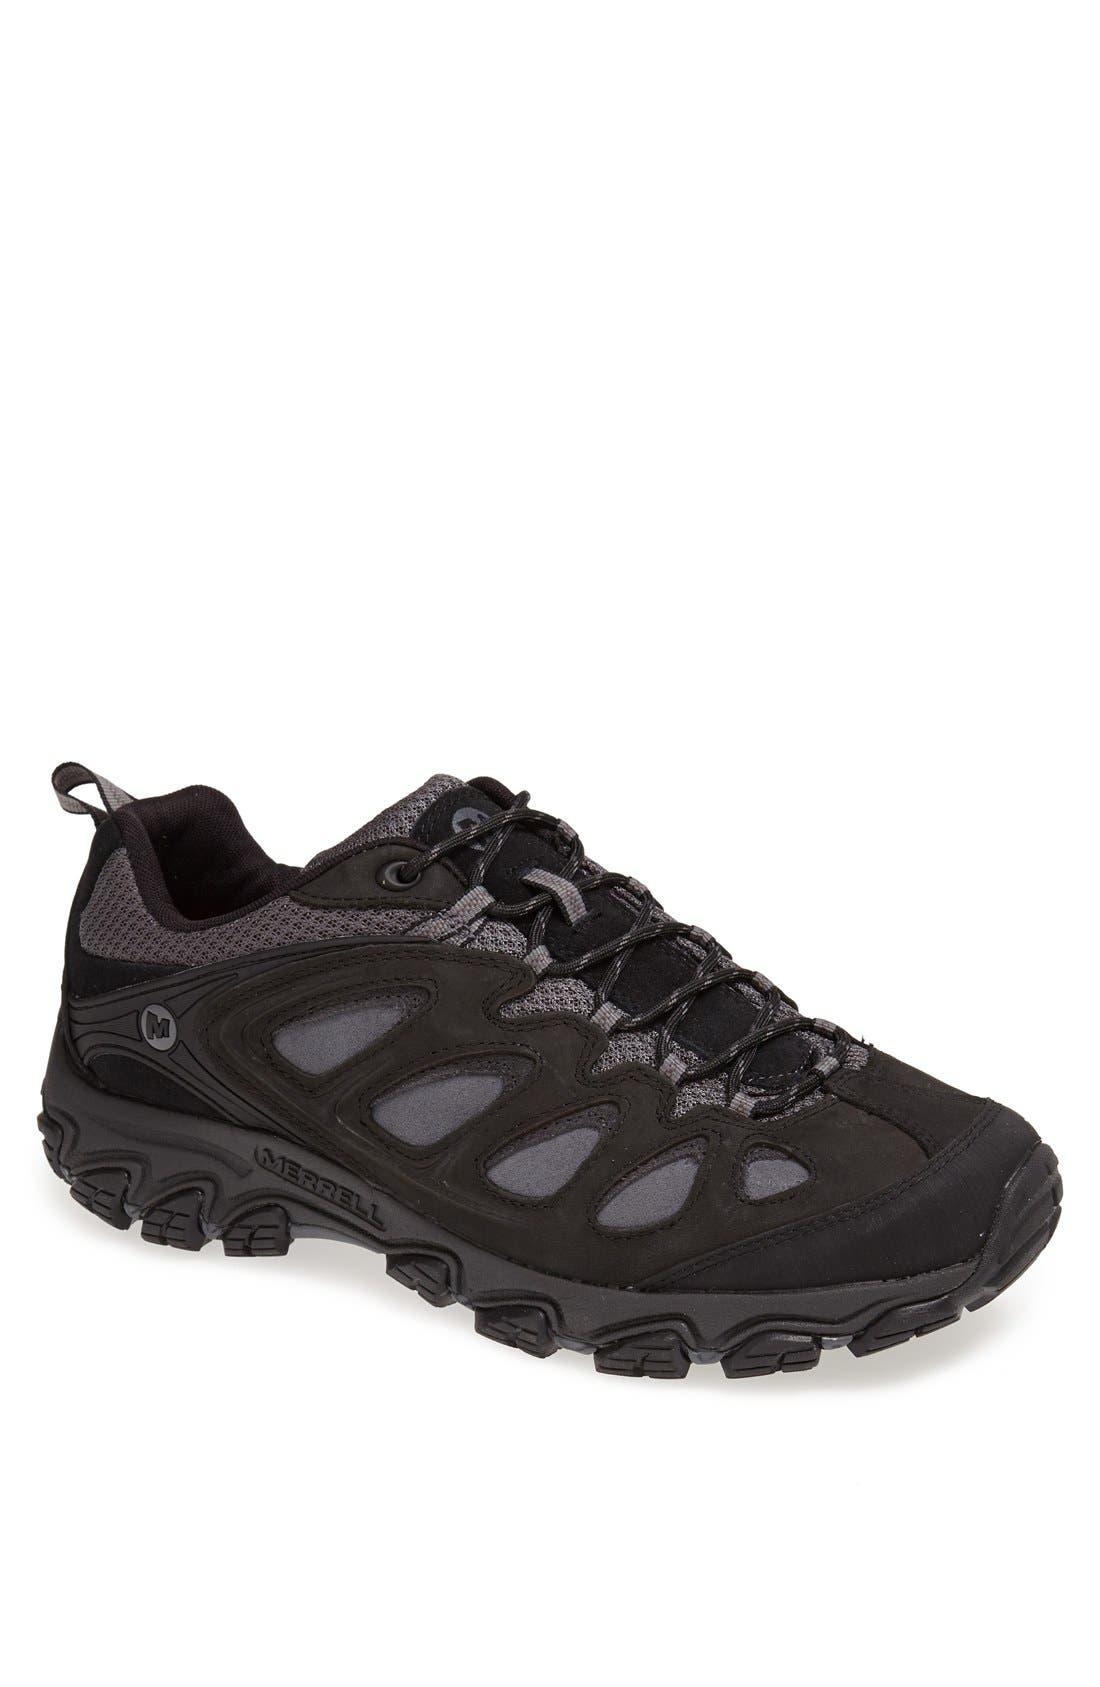 Main Image - Merrell 'Pulsate' Hiking Shoe (Men)